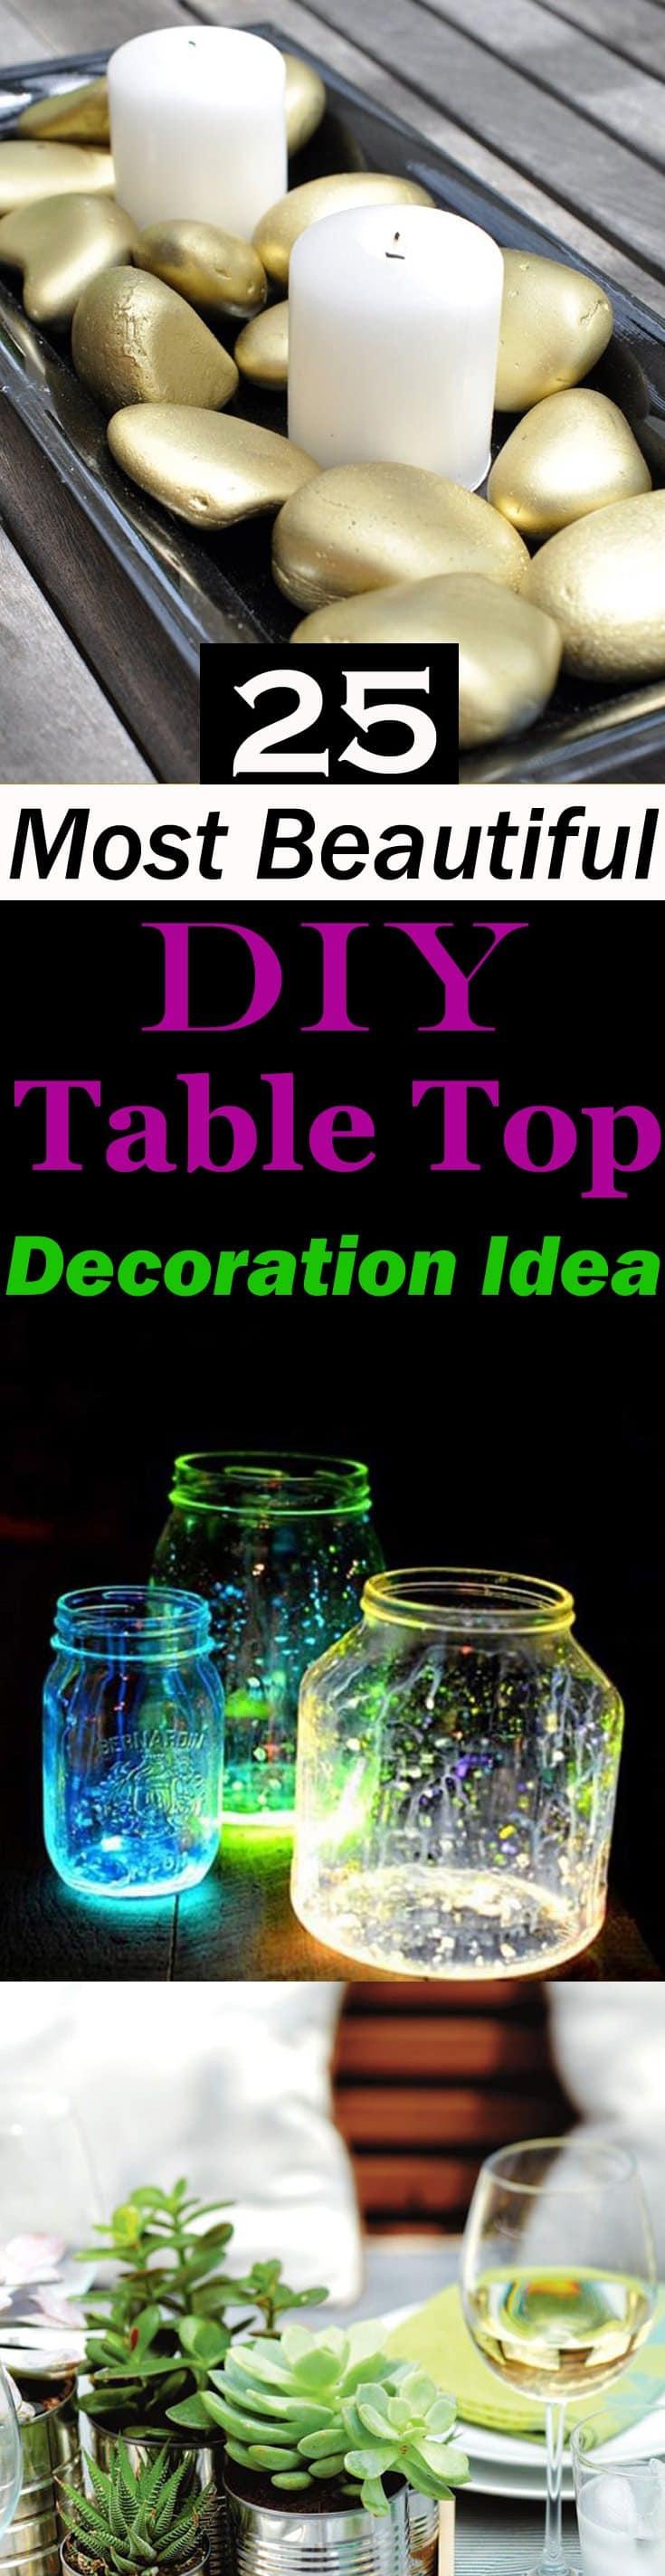 25 Most Beautiful DIY Table Top Decoration Ideas | Balcony Garden Web